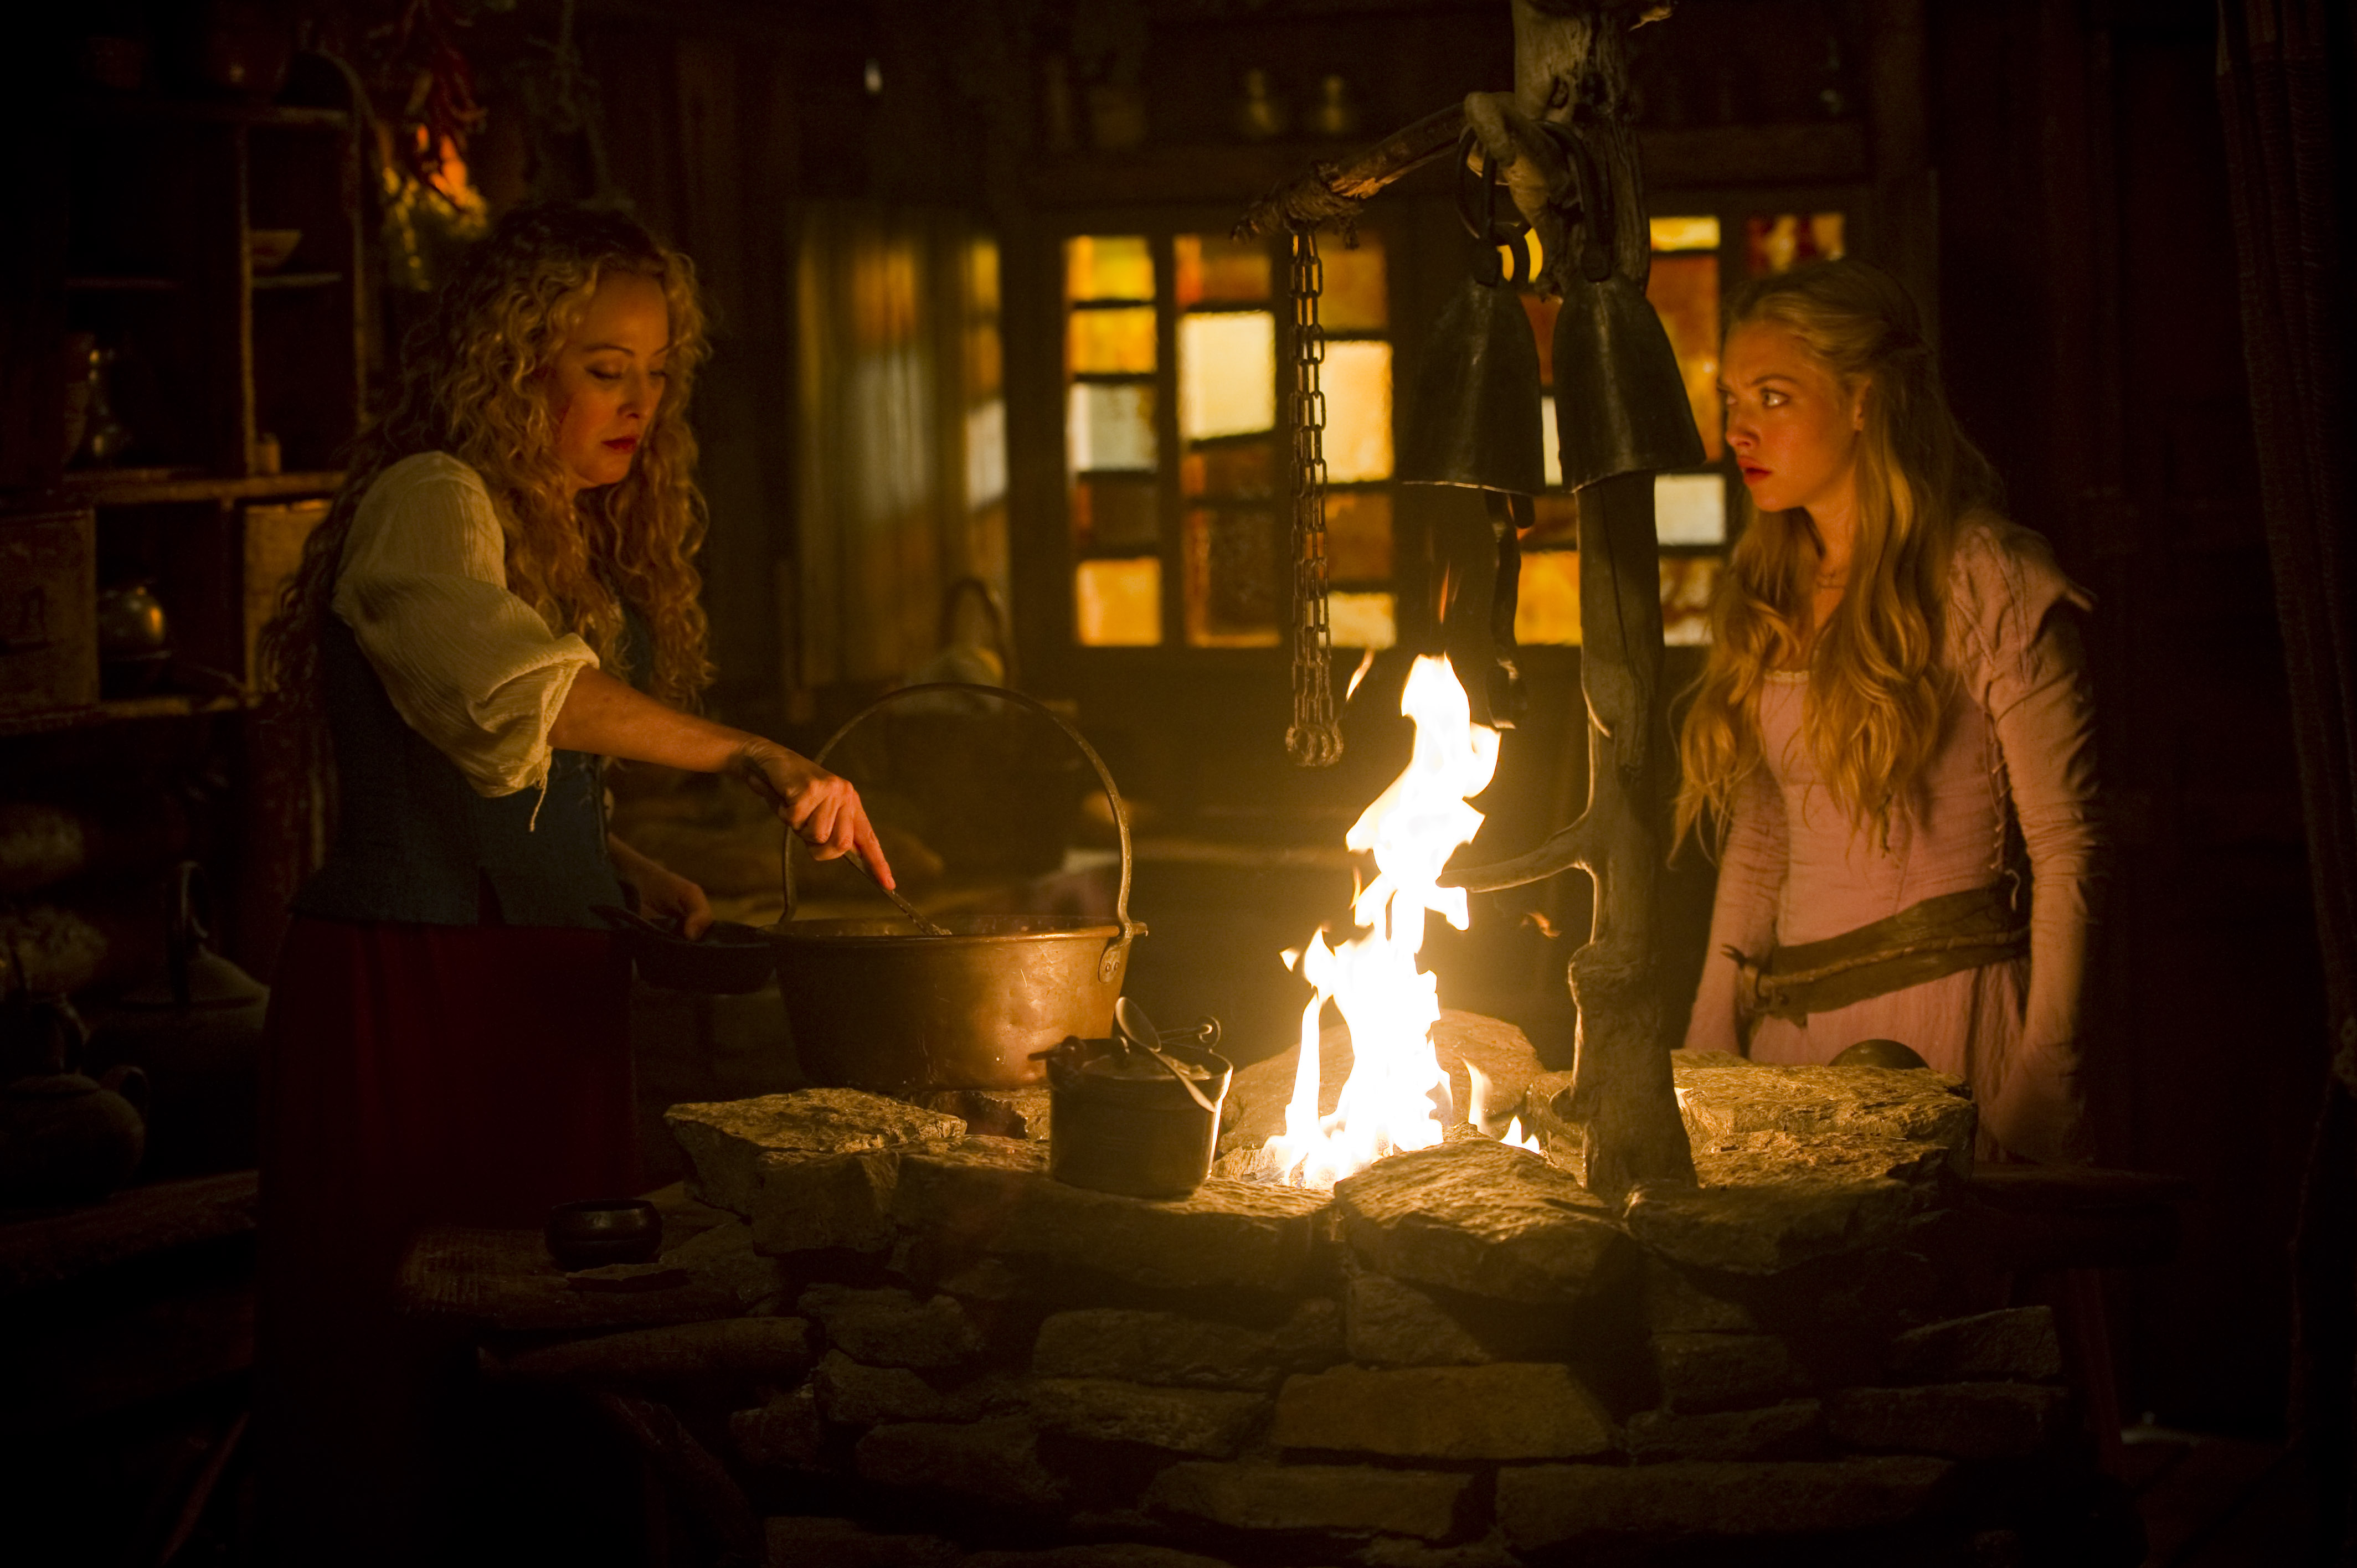 RED RIDING HOOD Movie Images Starring Amanda Seyfried  aeee0b3f217b